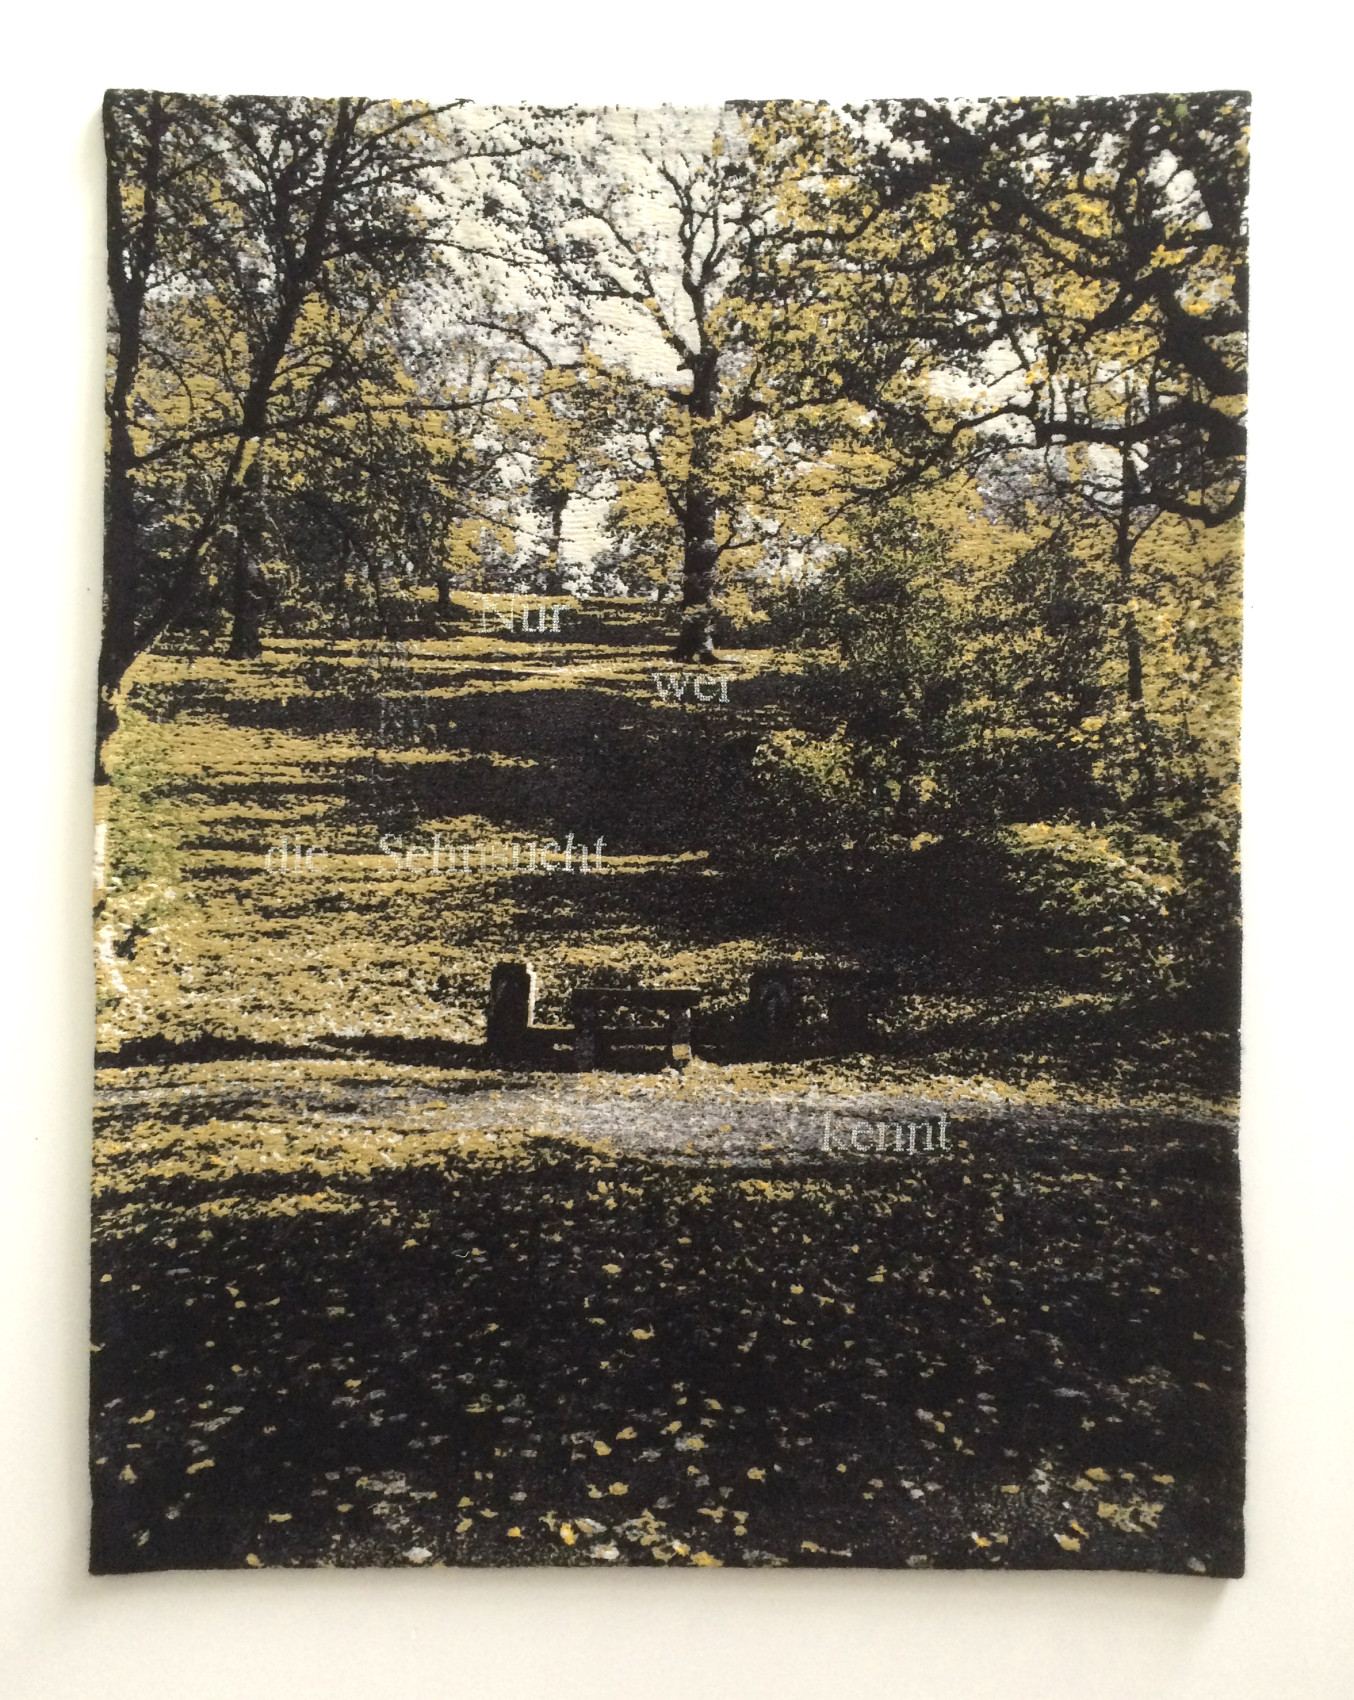 'Nur wer die Sehnsucht kennt' - (Goethe) - Park Anna Amalia, Tiefurt, Weimar- Jacquard woven - double weaves - mohair and cashwool -text embroideredby hand - 148x 190 cm - 2013